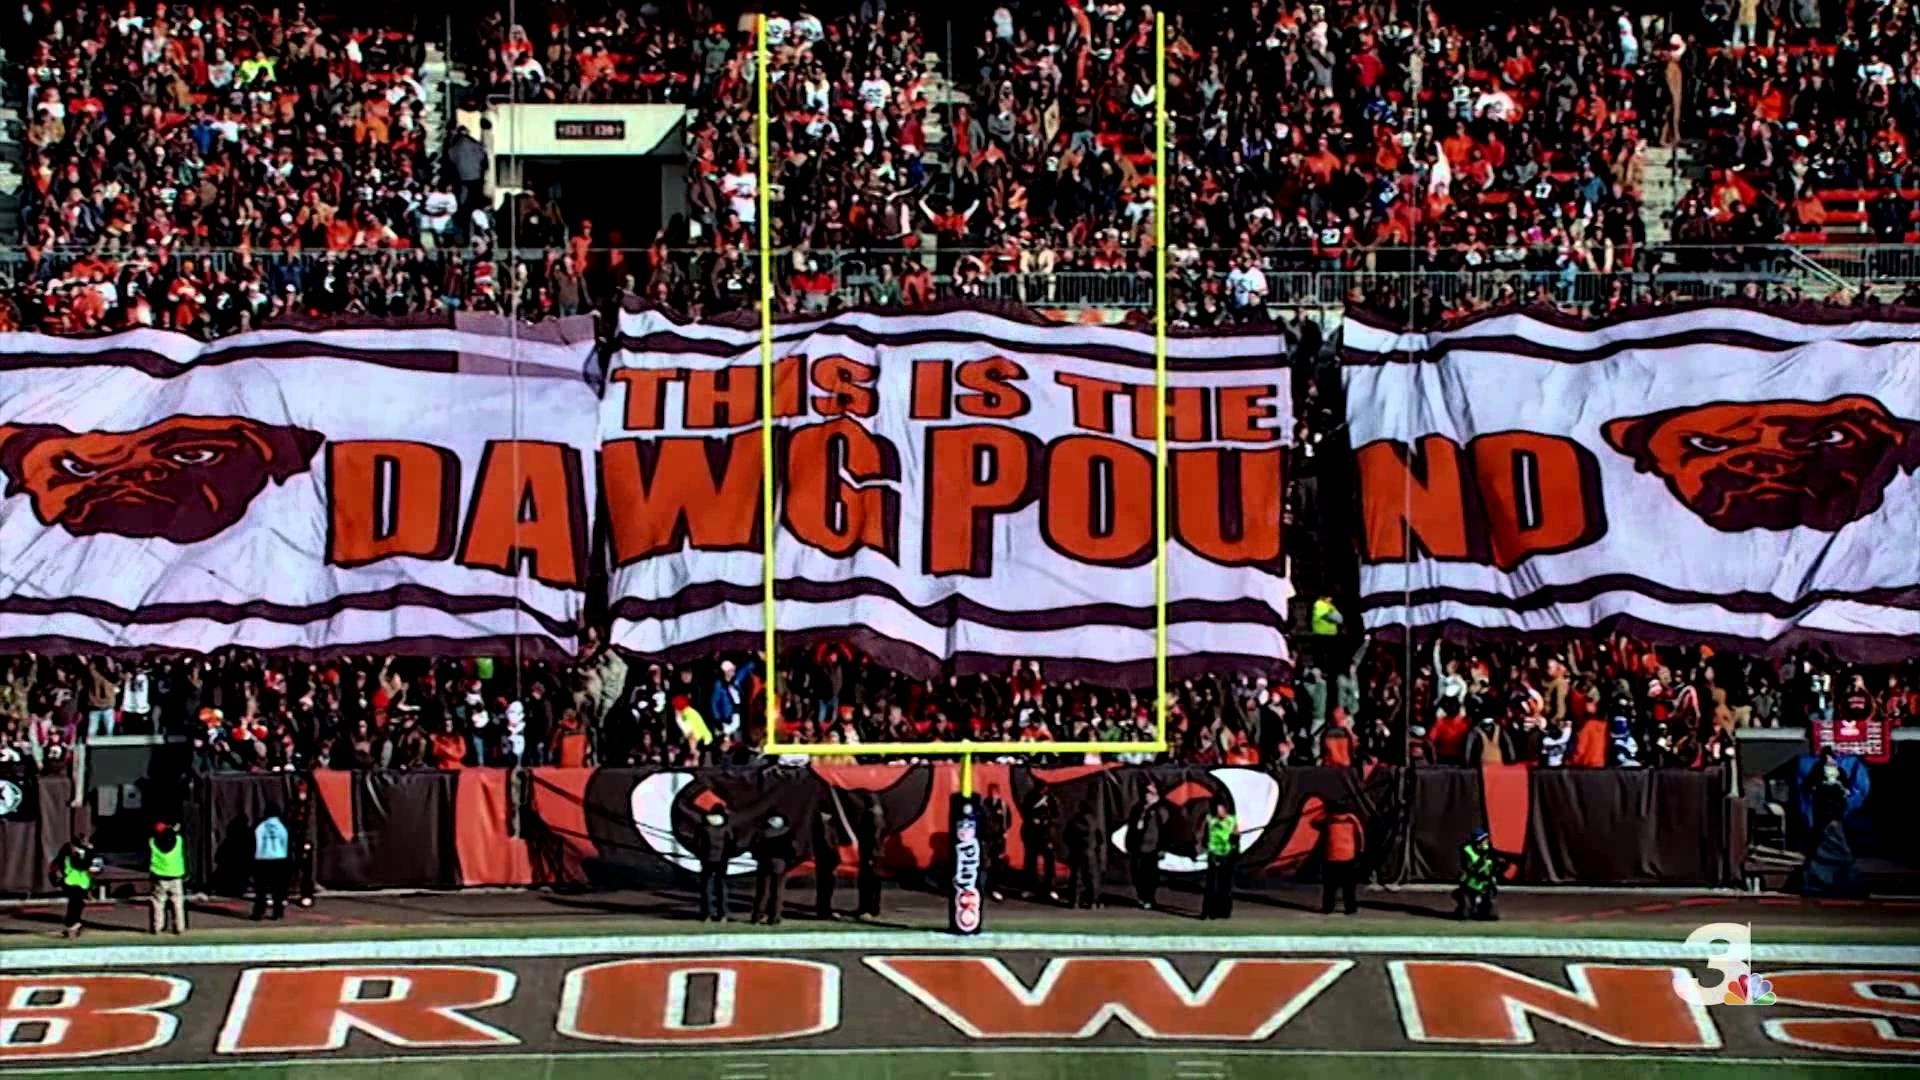 Cleveland Browns Player Wallpaper Desktop – https://wallucky.com/cleveland -browns-player-wallpaper-desktop/ | Wallpapers and Backgrounds HD |  Pinterest …